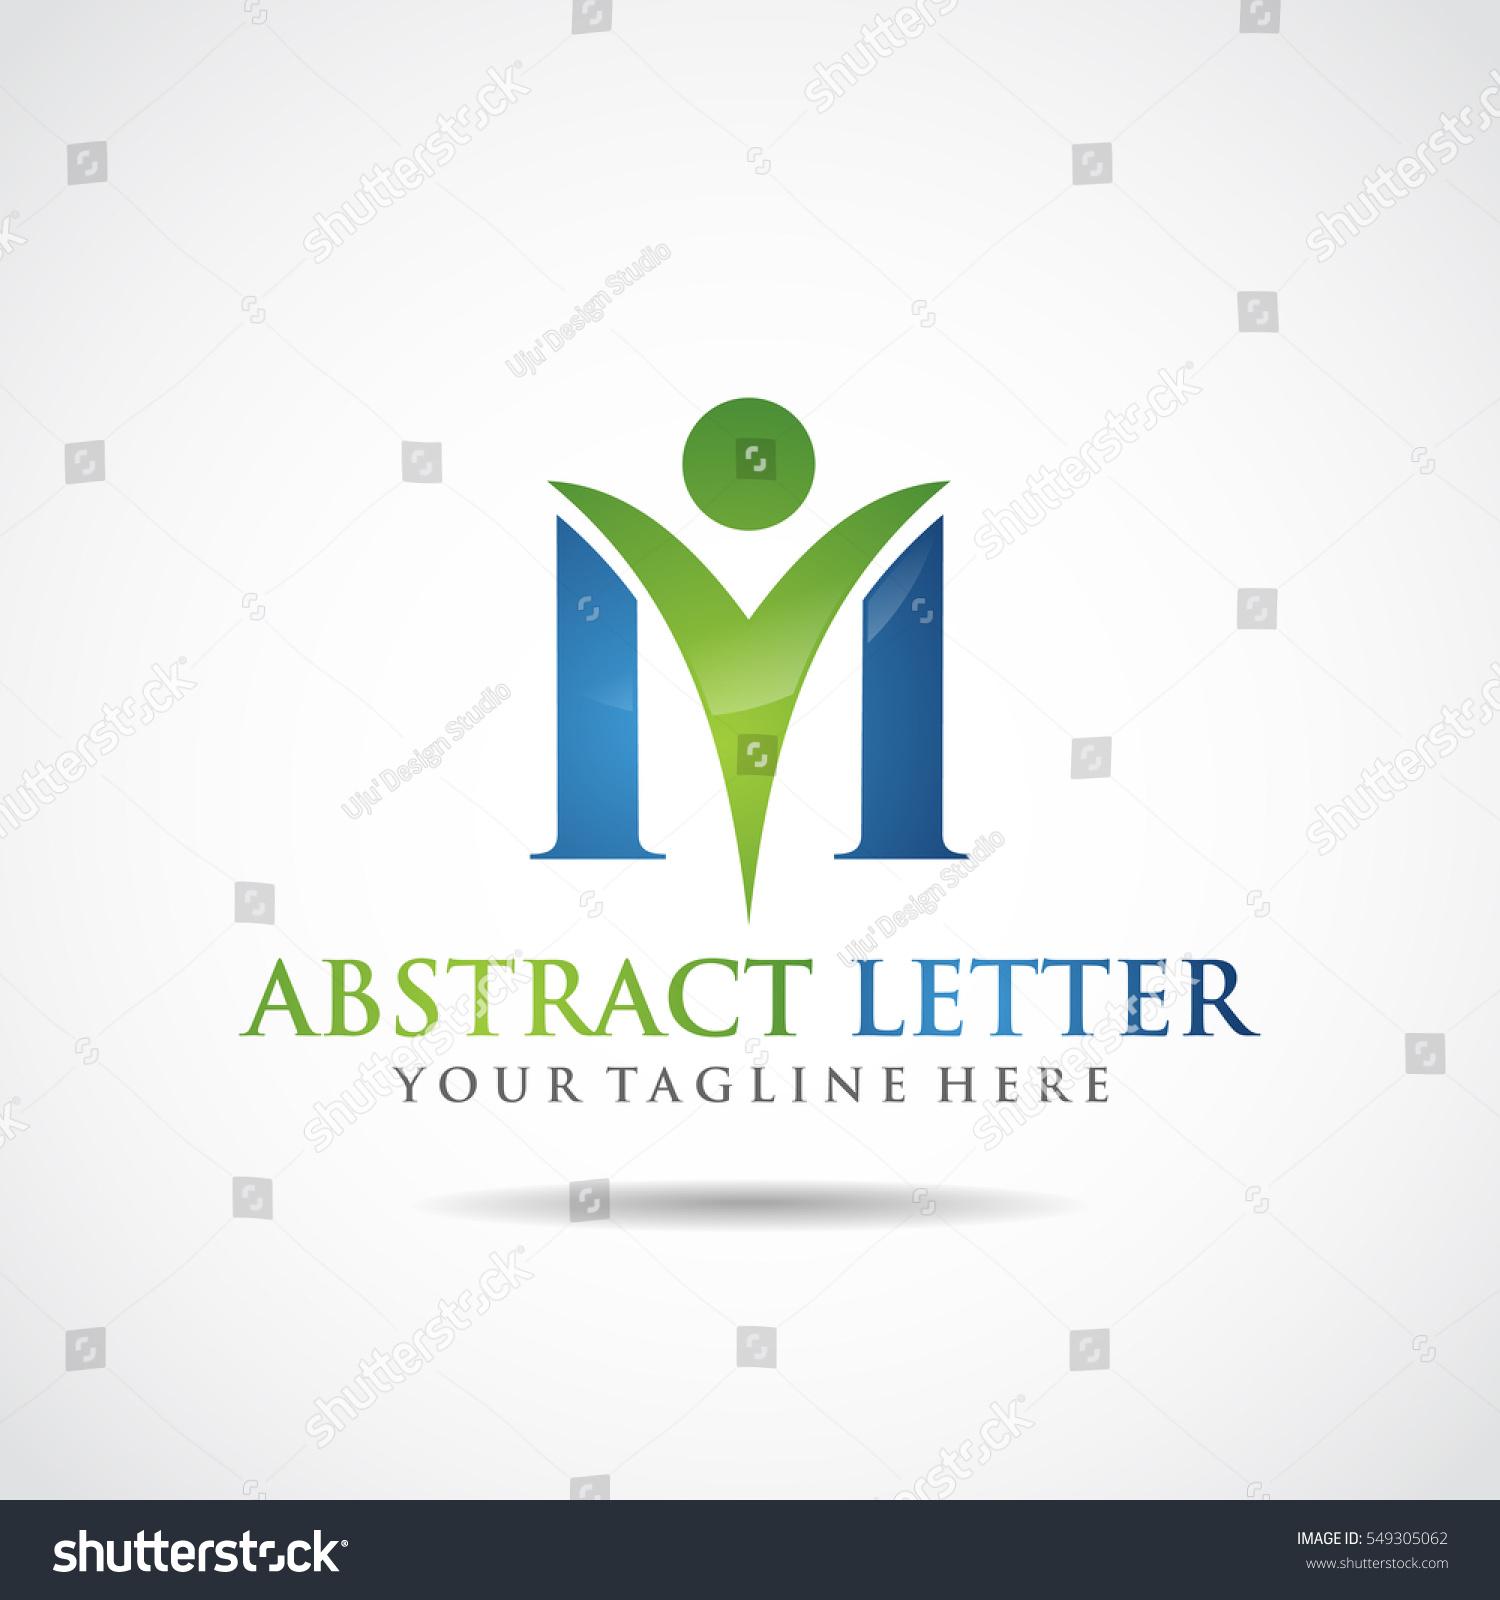 Fantastisch Adobe Illustrator Logo Vorlagen Ideen - Entry Level ...